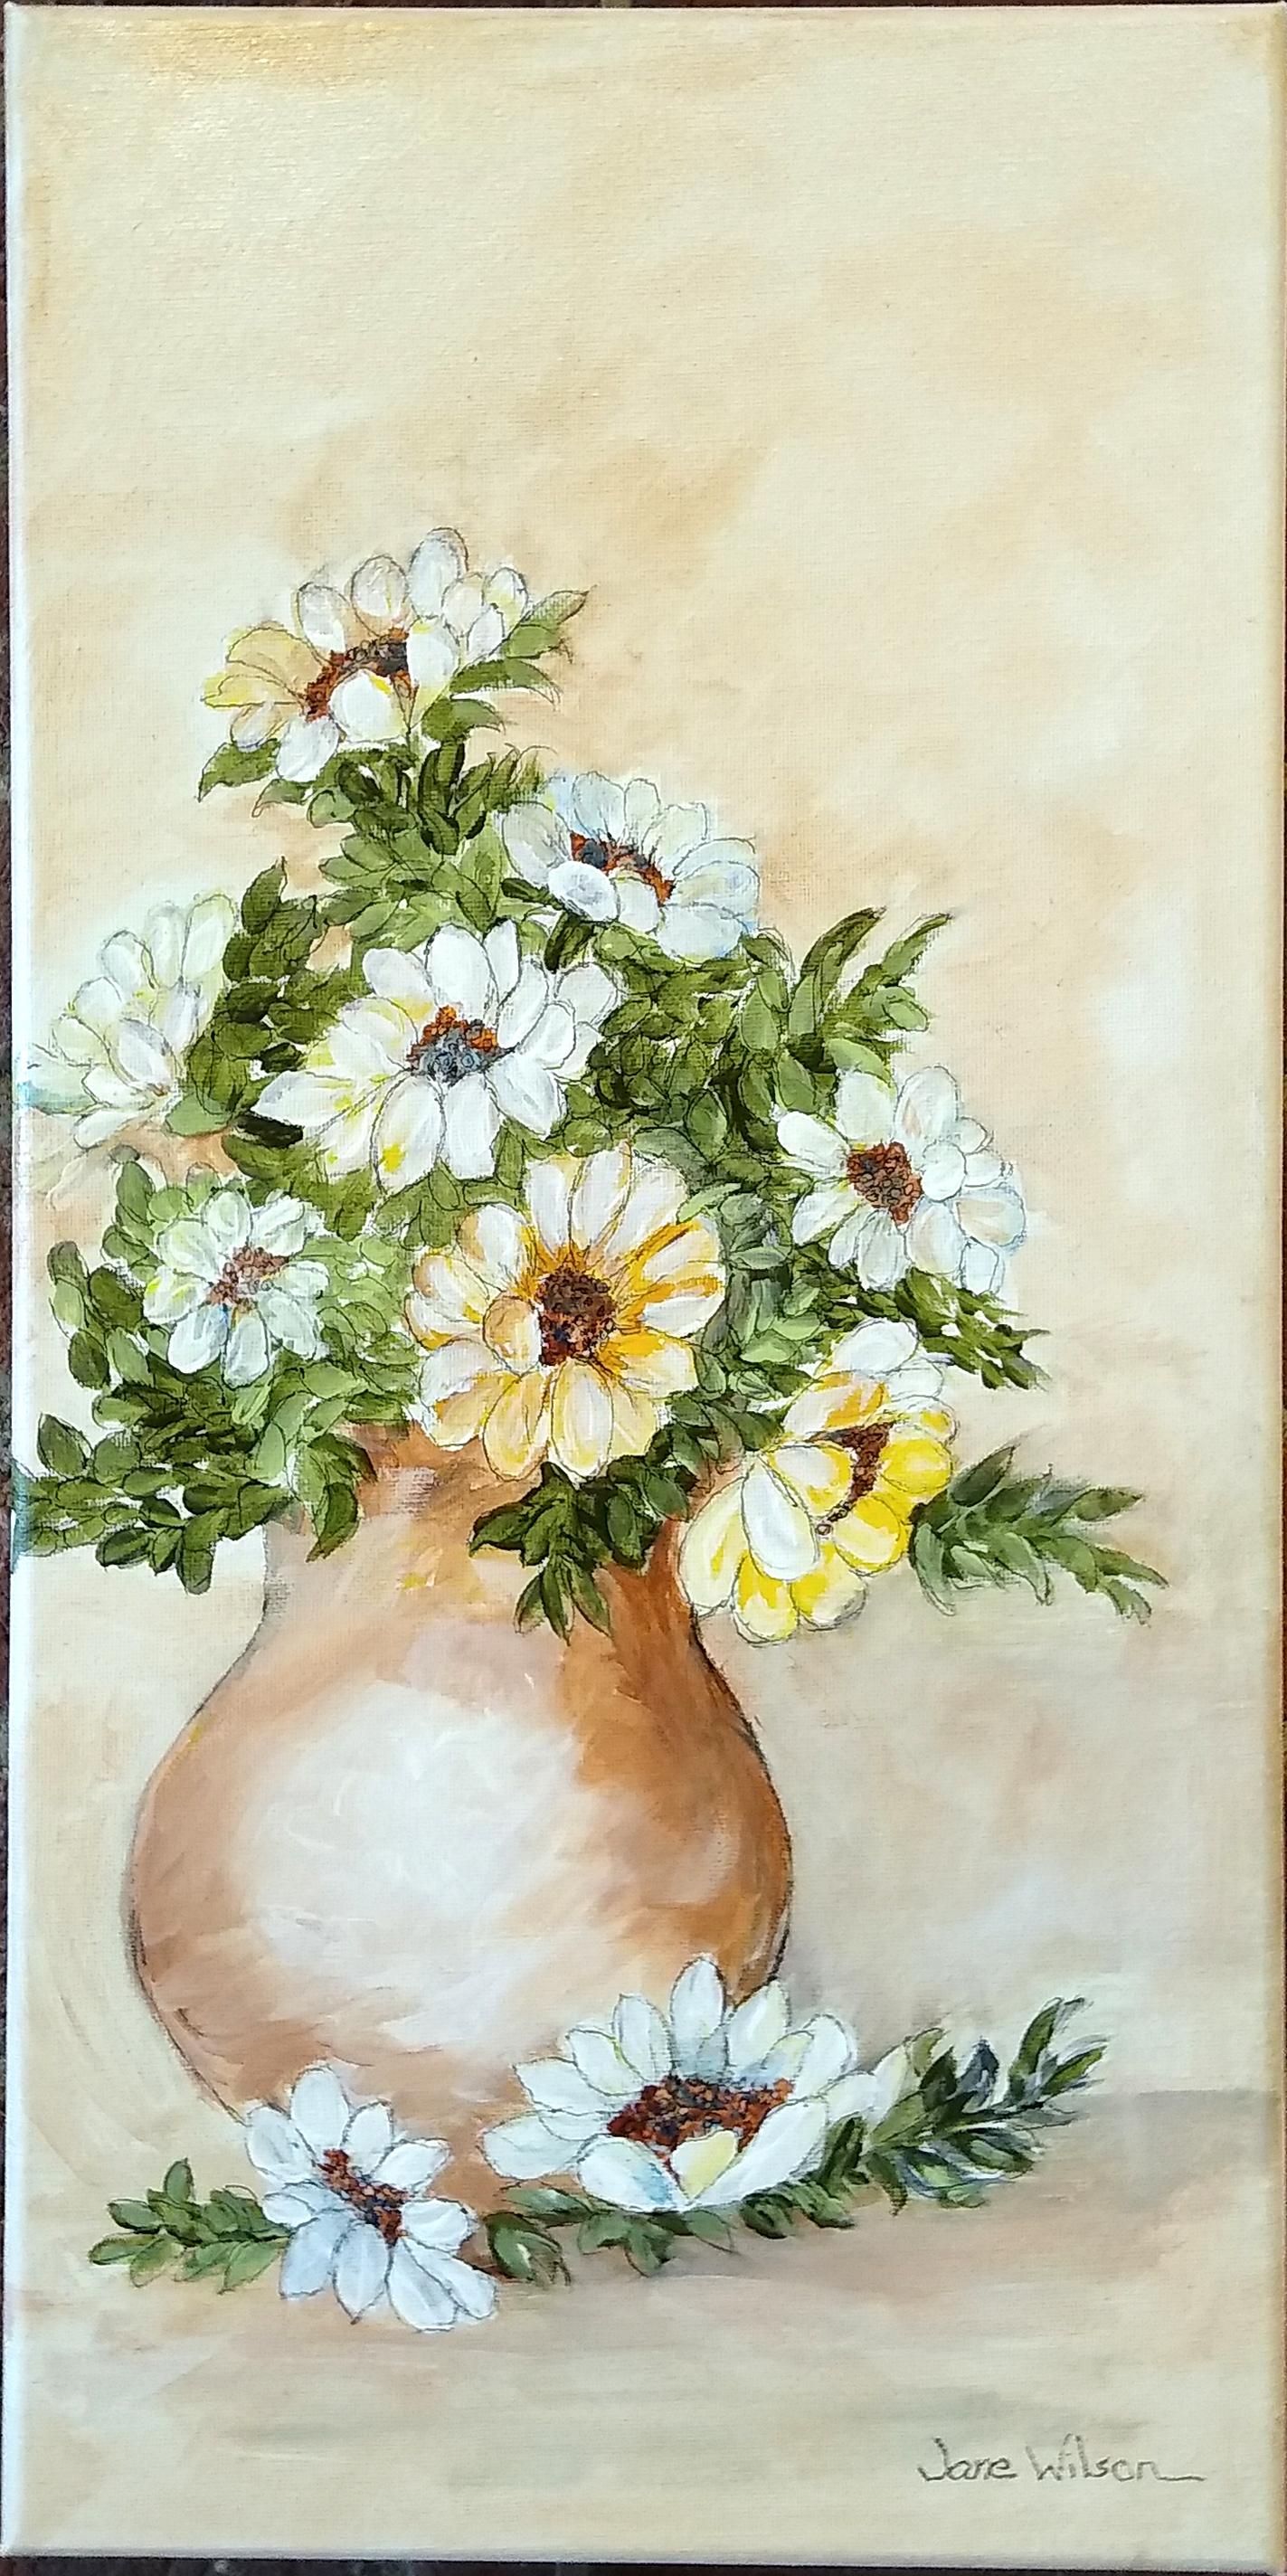 acrylic by Jane Wilson